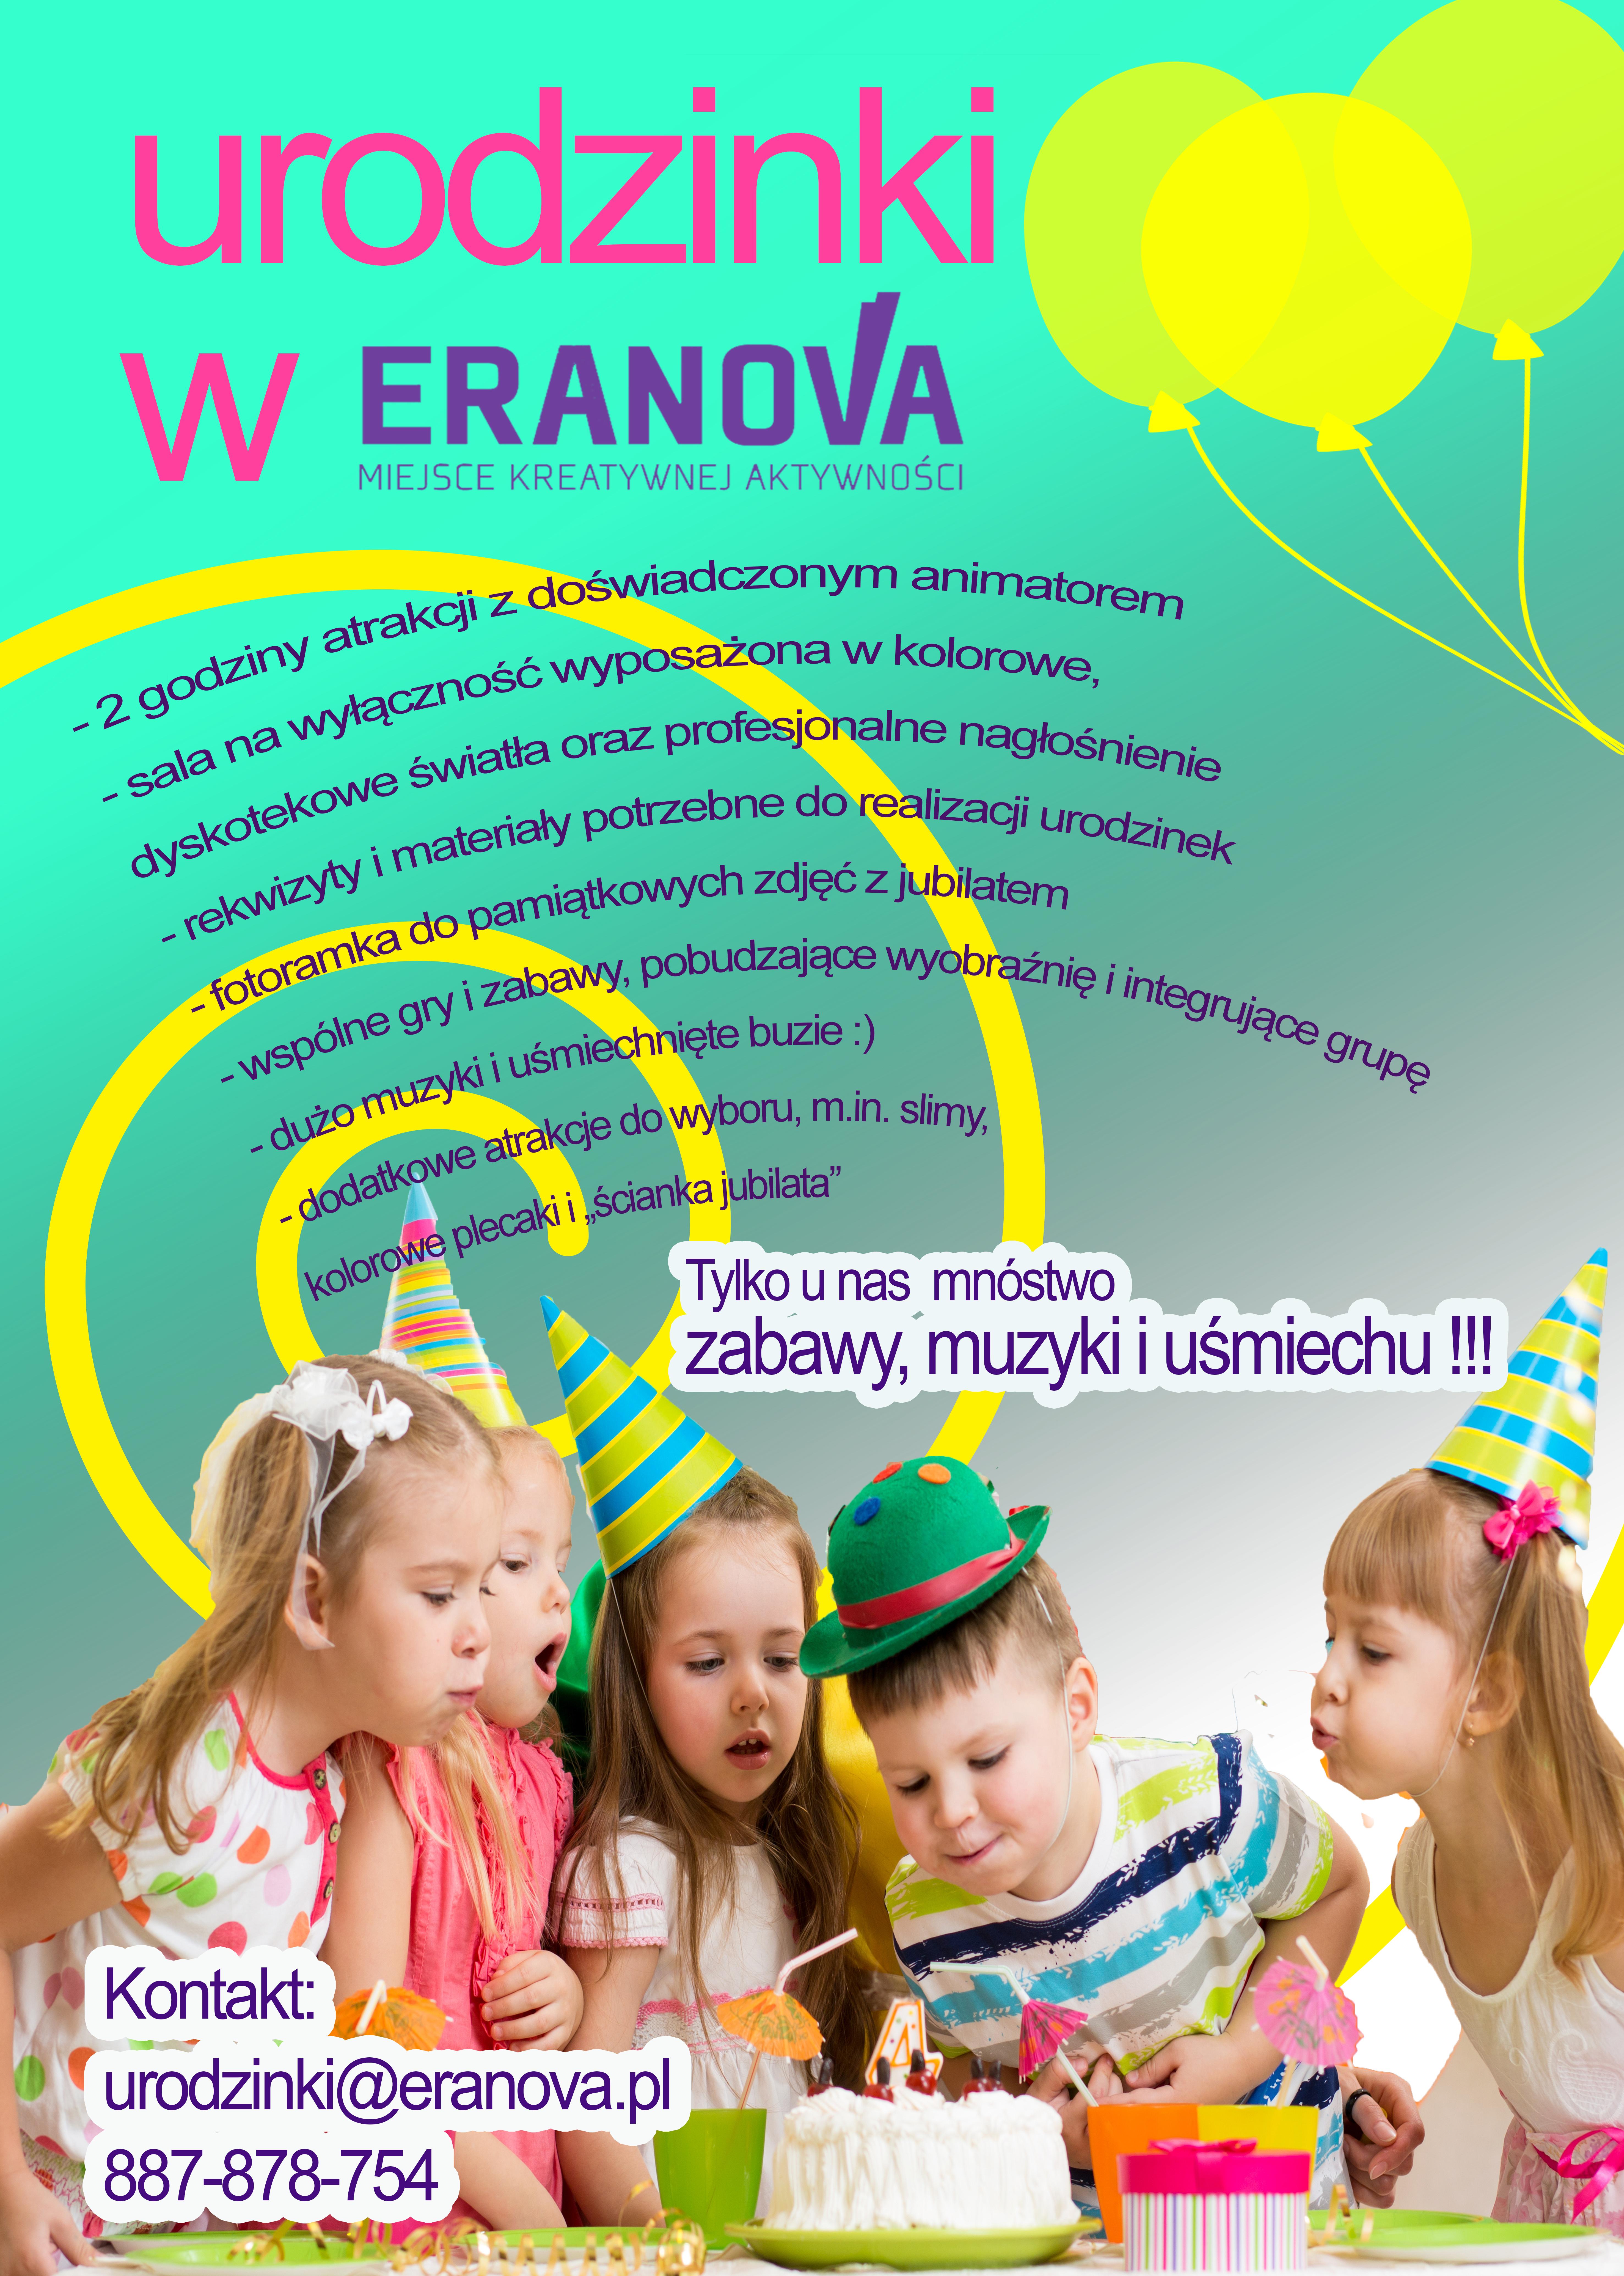 http://m.eranova.pl/2020/03/orig/plakat-urodzinki-3188-3299.jpg